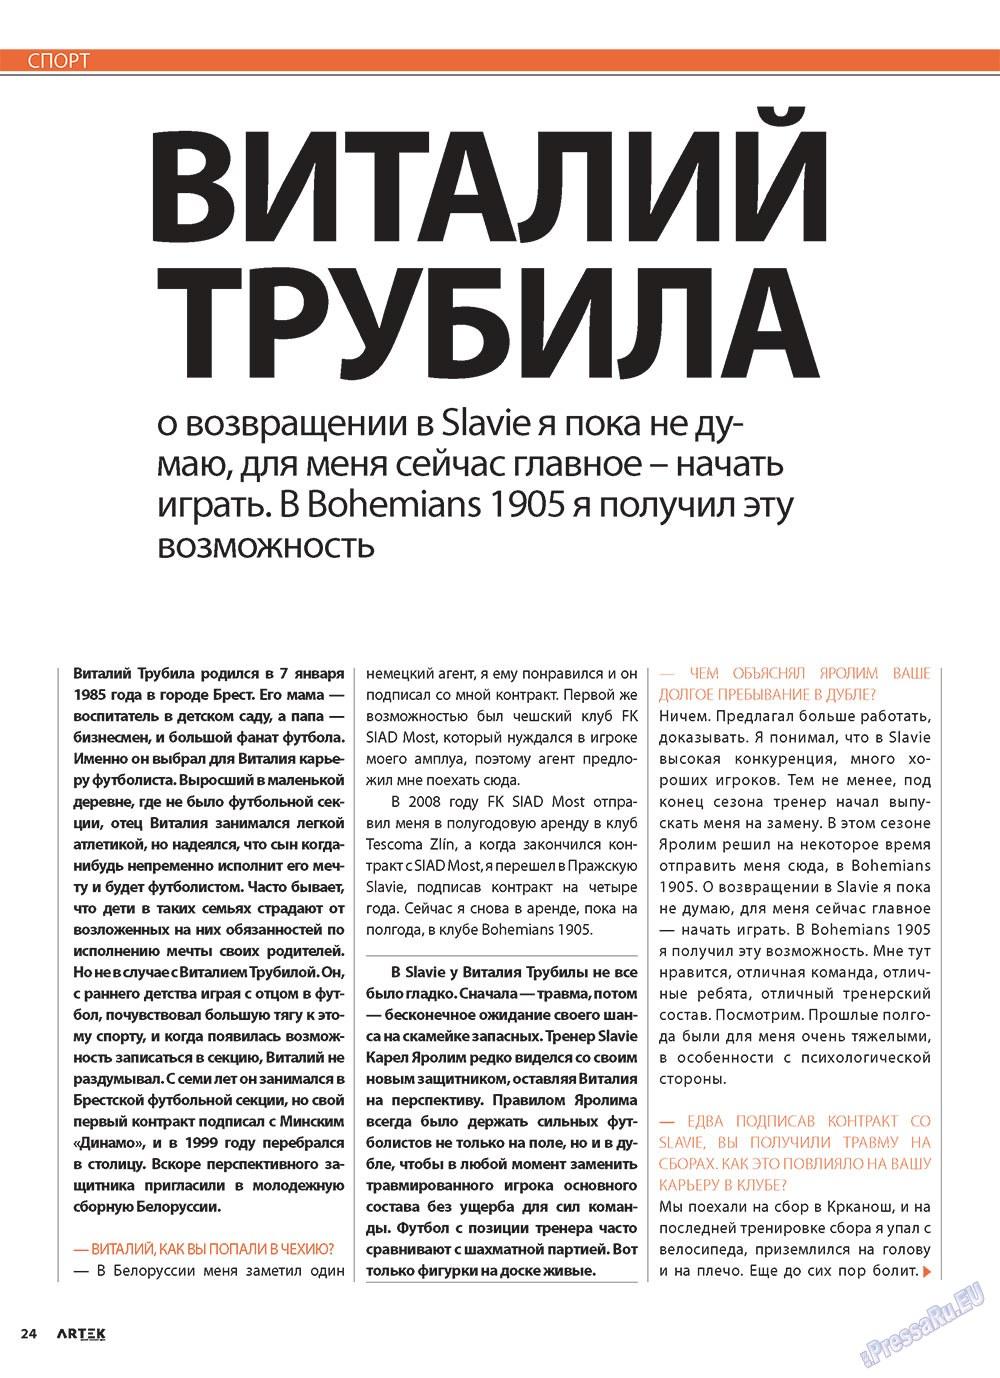 Артек (журнал). 2010 год, номер 4, стр. 26